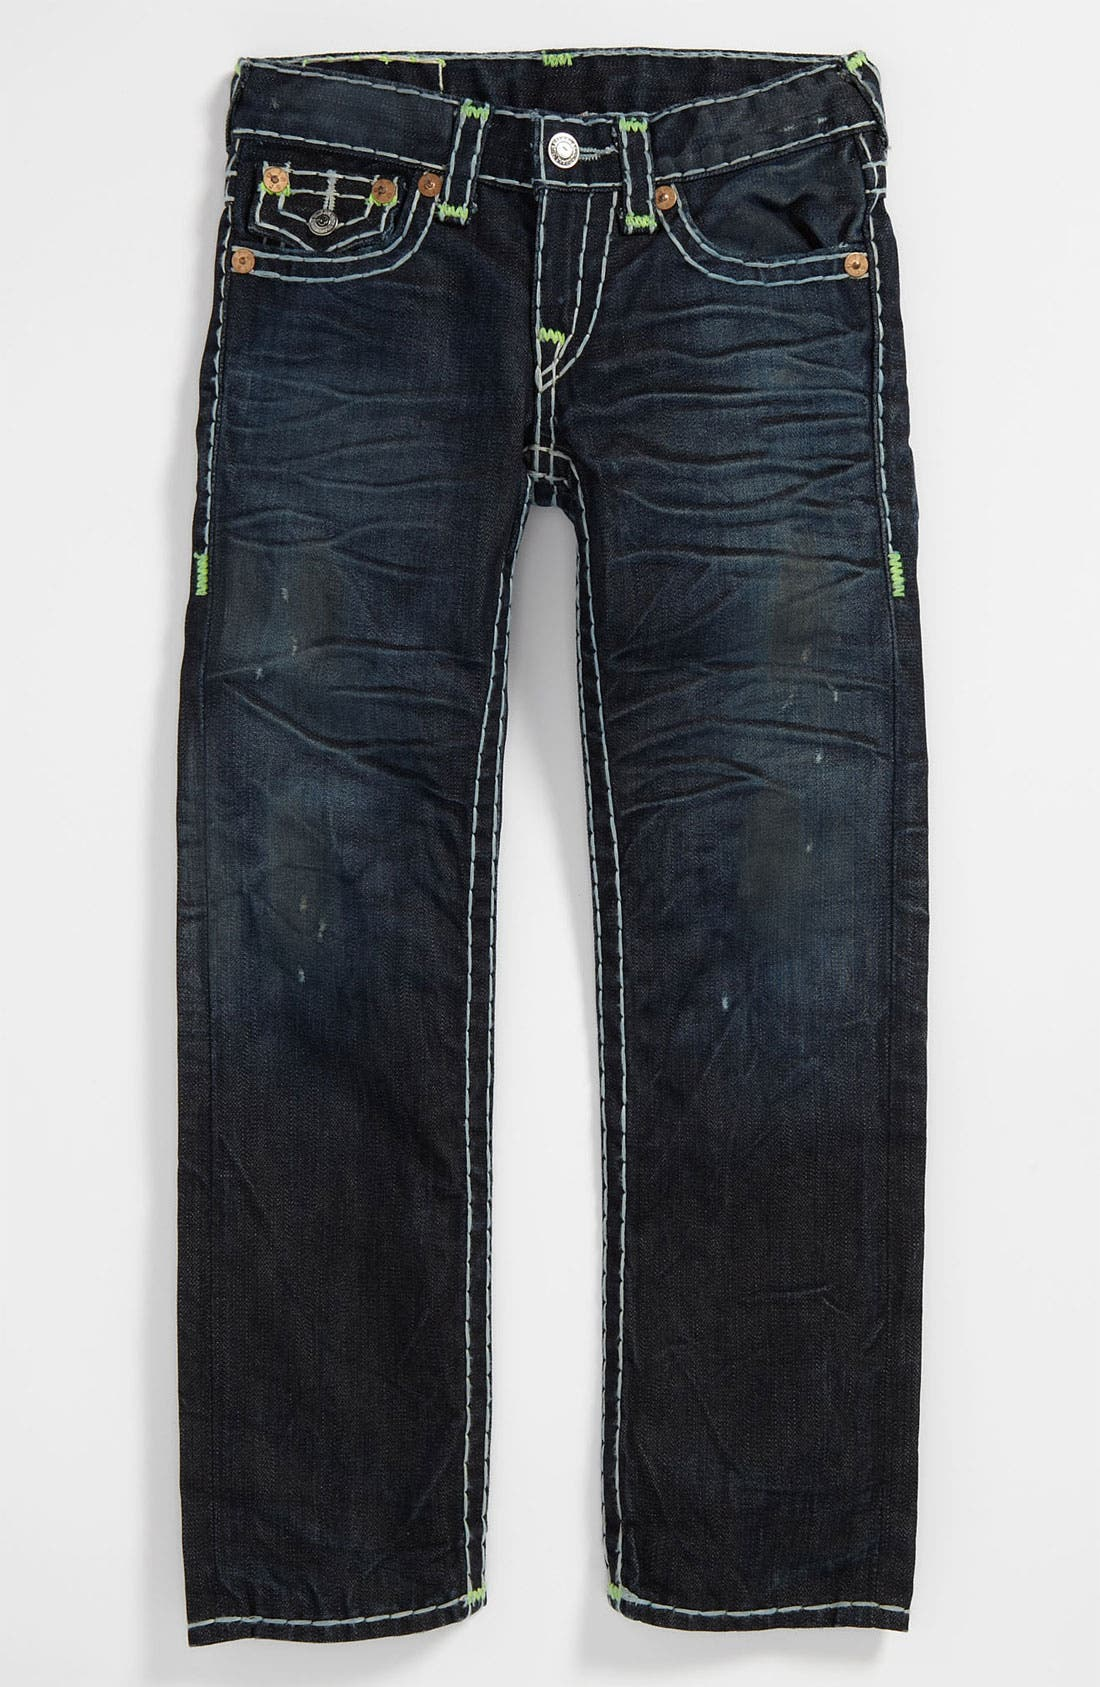 Alternate Image 2  - True Religion Brand Jeans 'Jack Super T' Jeans (Big Boys)